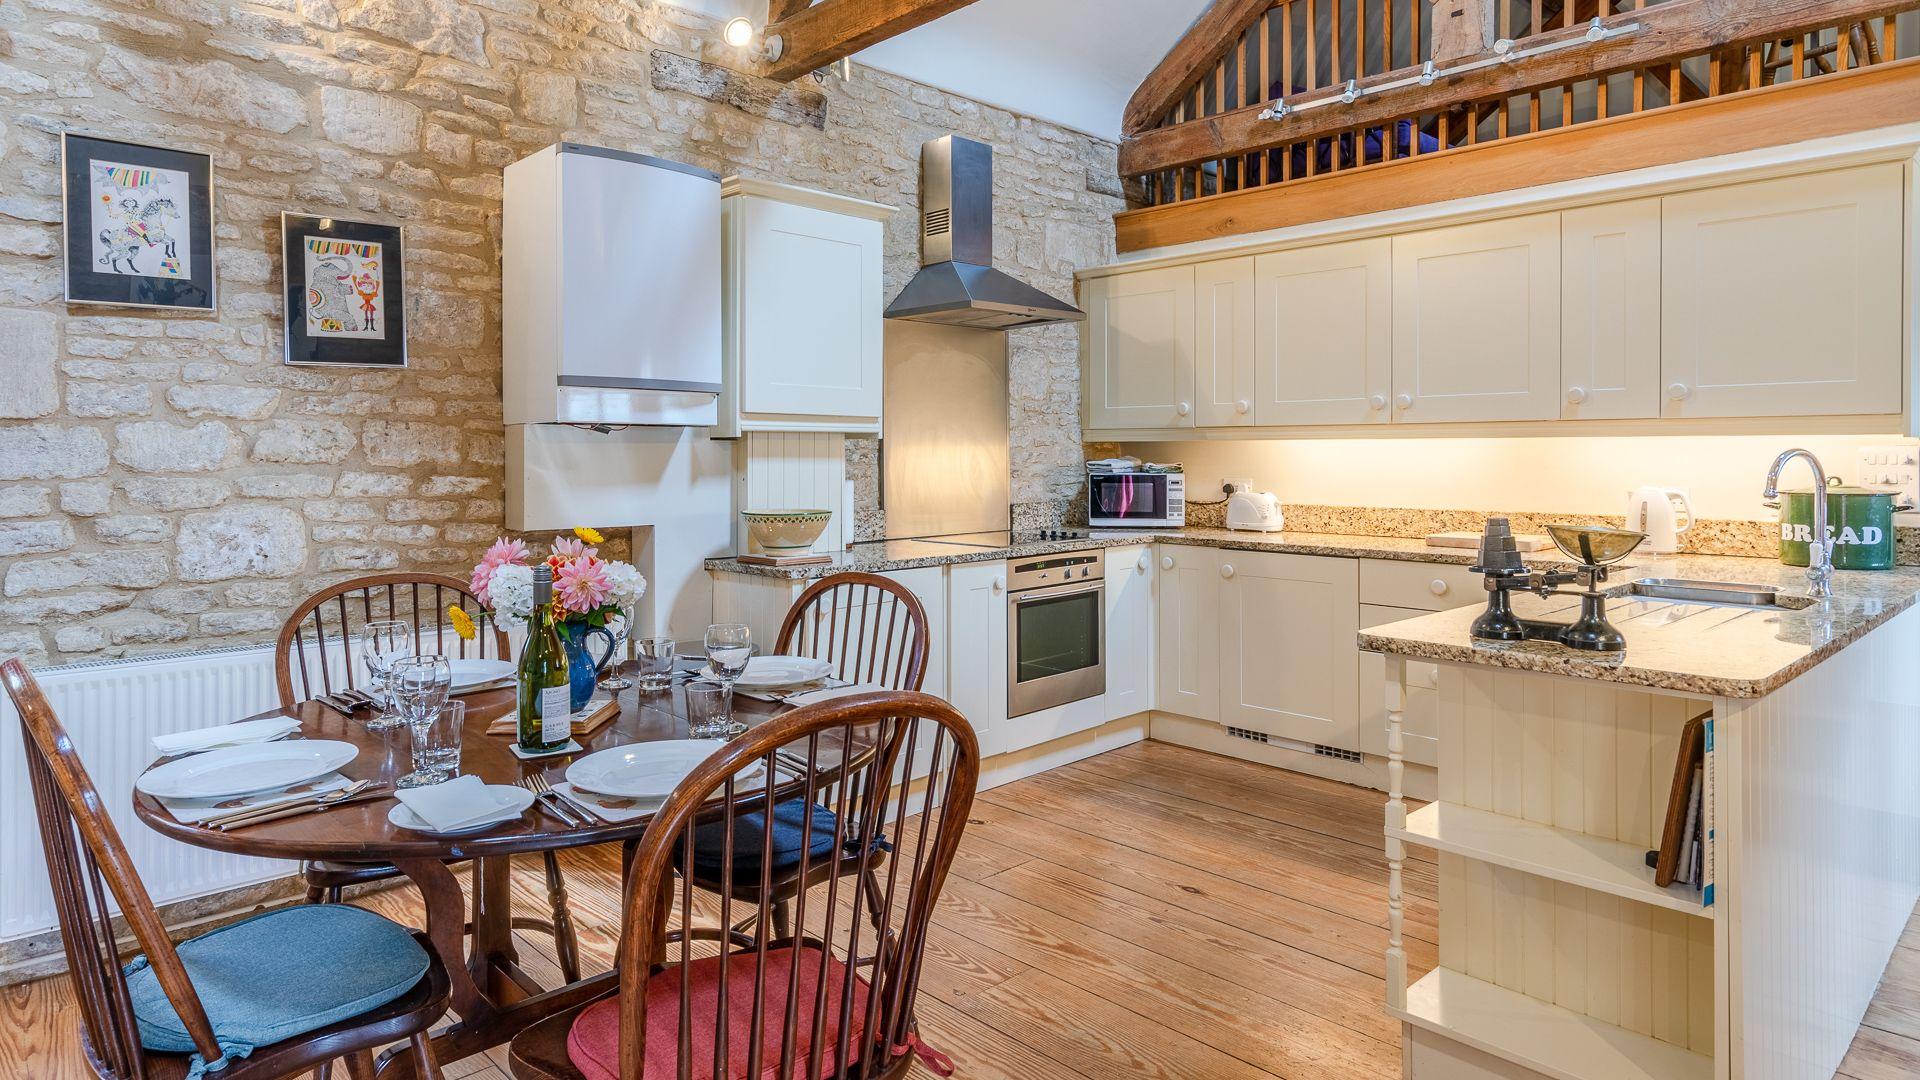 Dining-kitchen area, Aylworth Manor Granary, Bolthole Retreats